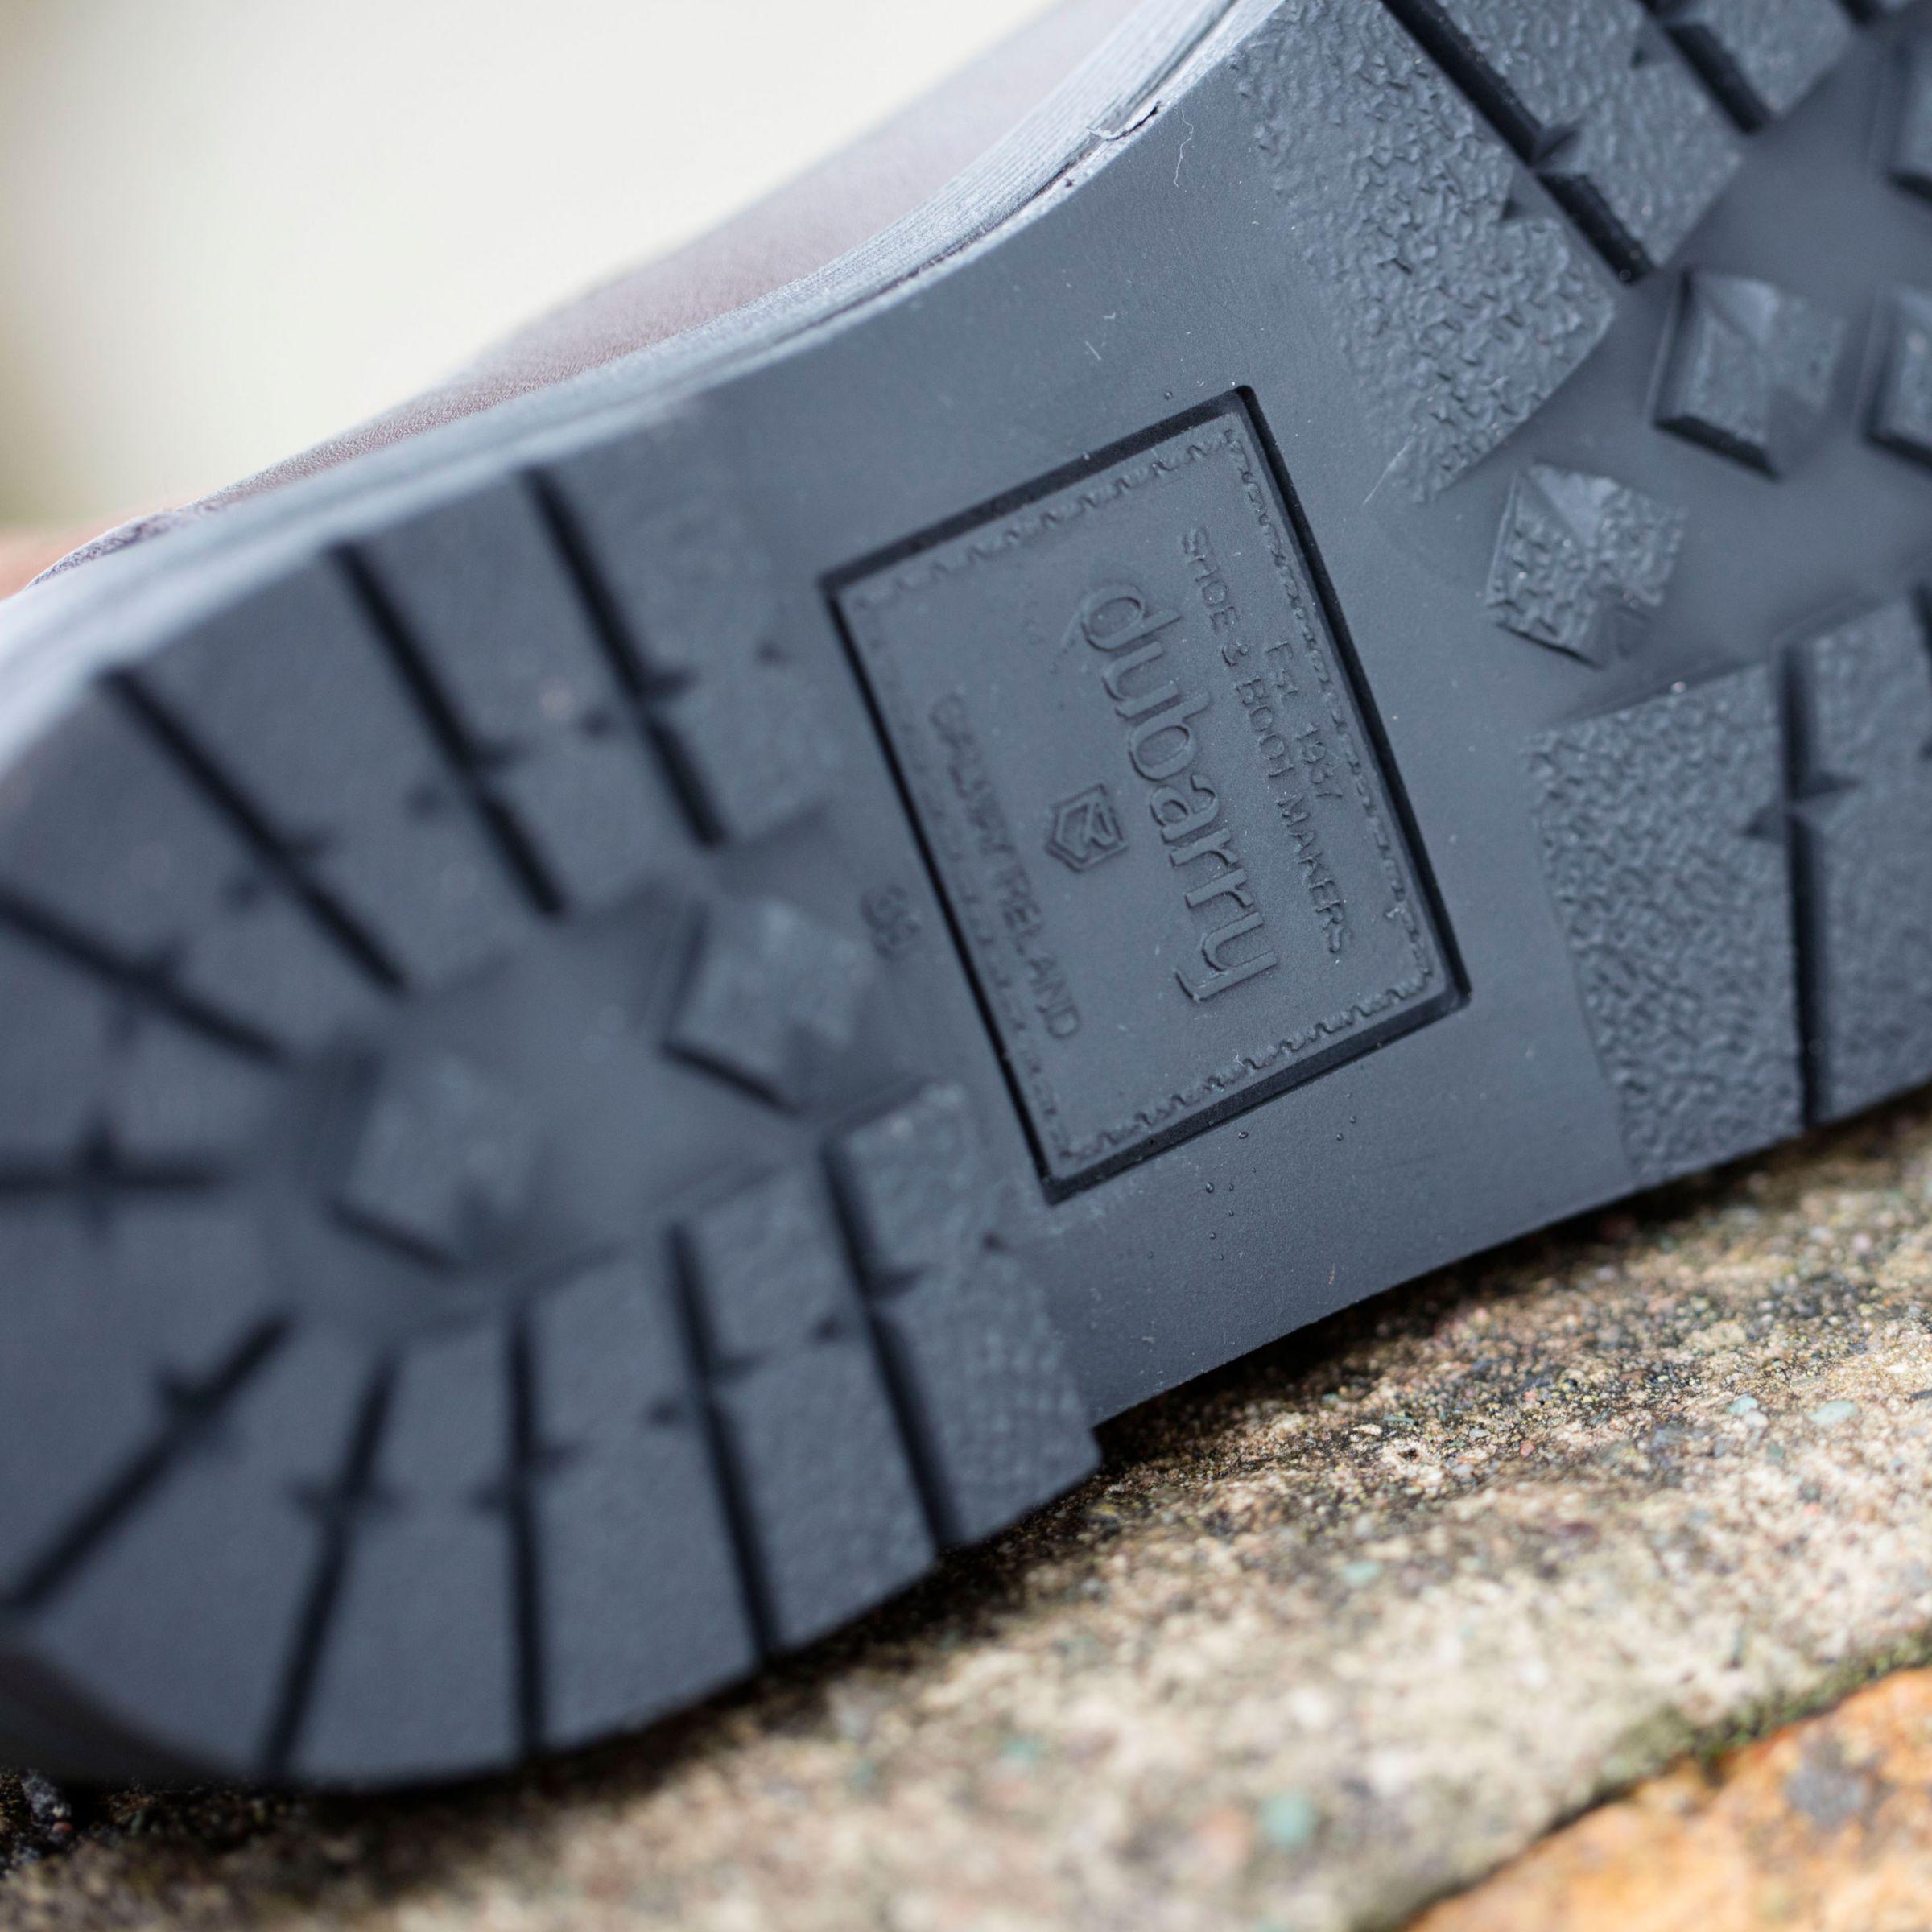 Dubarry Leather Galway Gortex Waterproof Knee High Boots